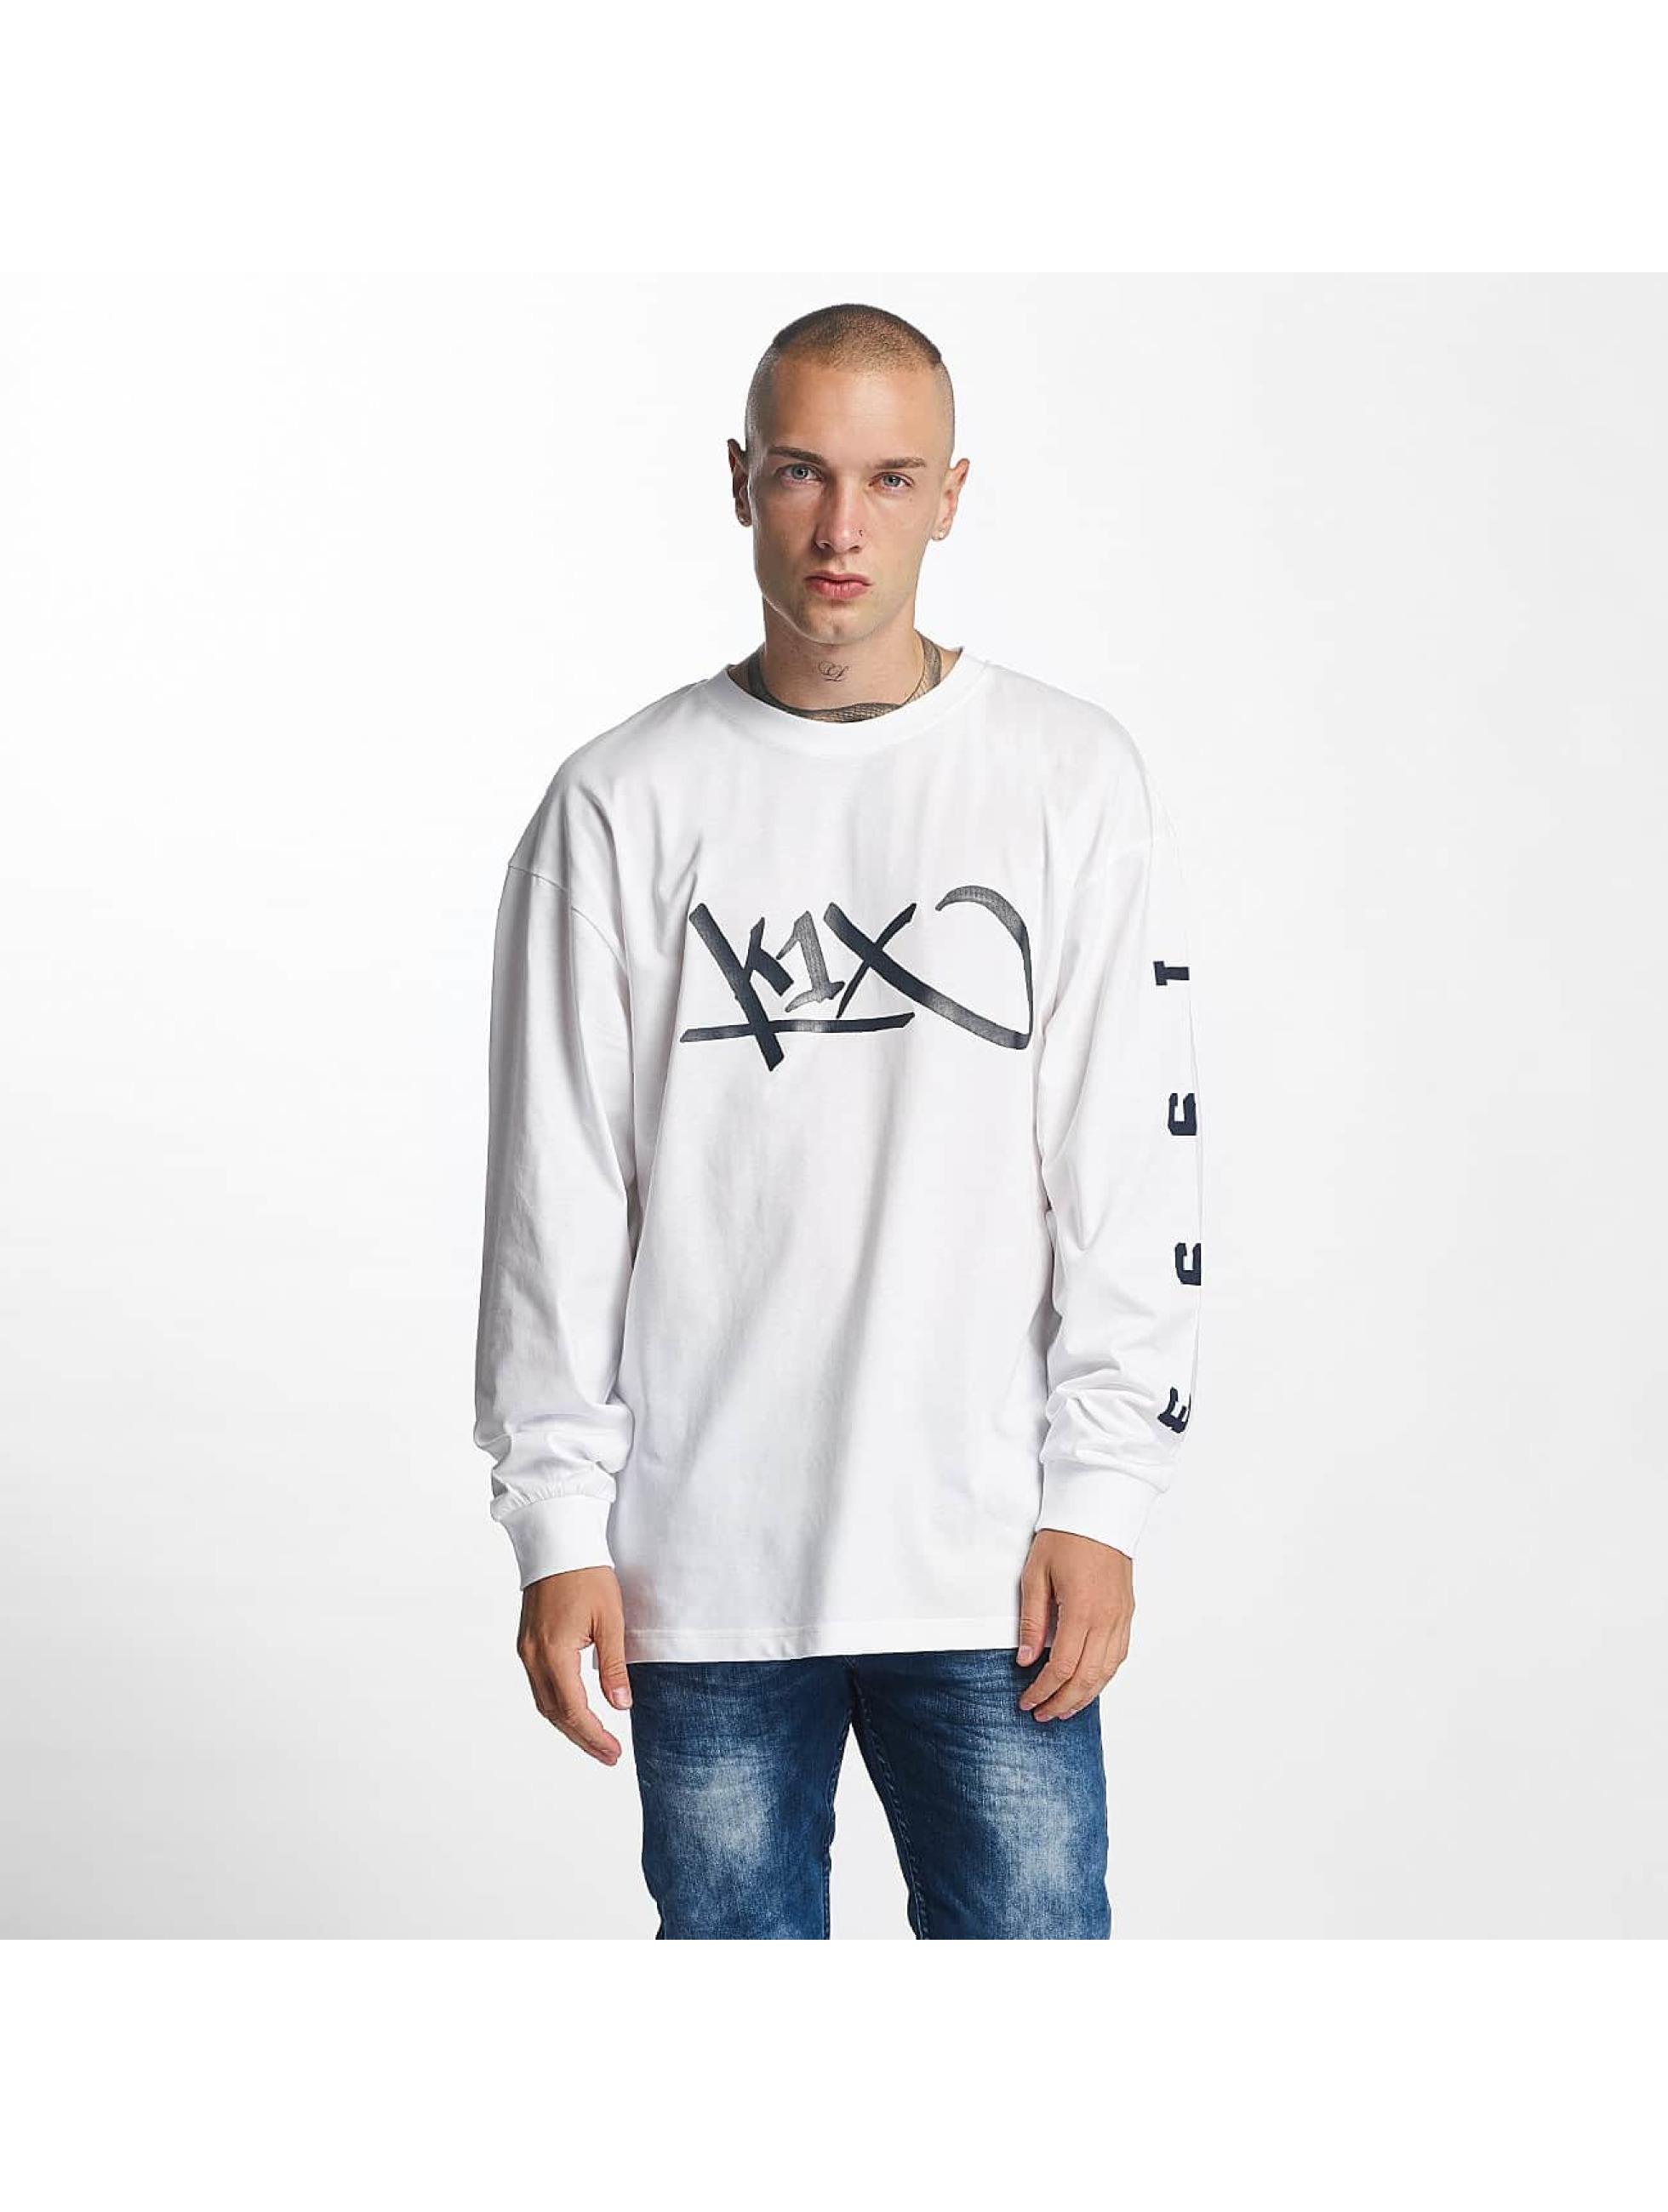 K1X Langermet Ivery Sports hvit